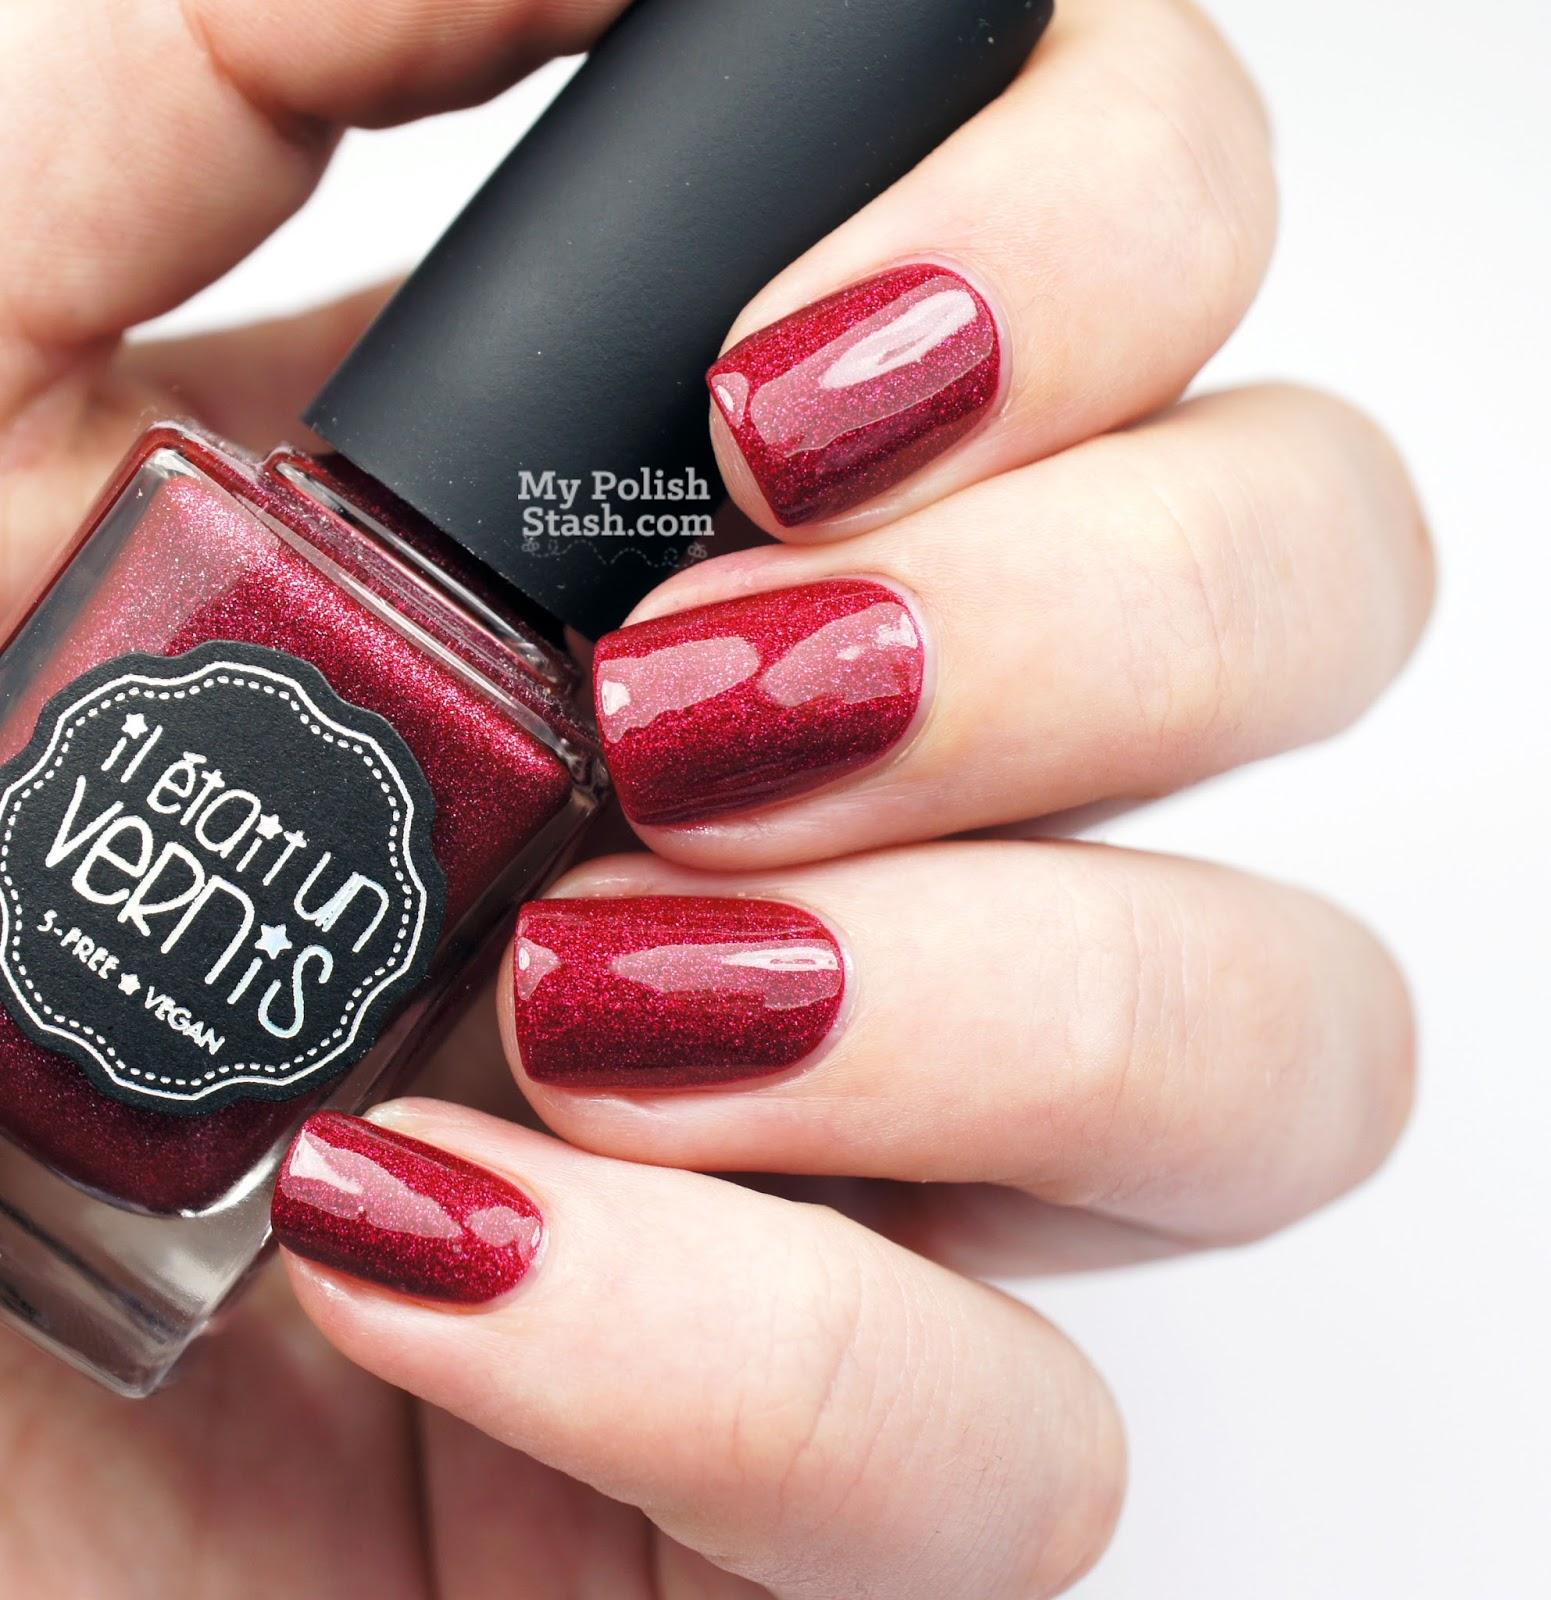 french indie nail polish brand